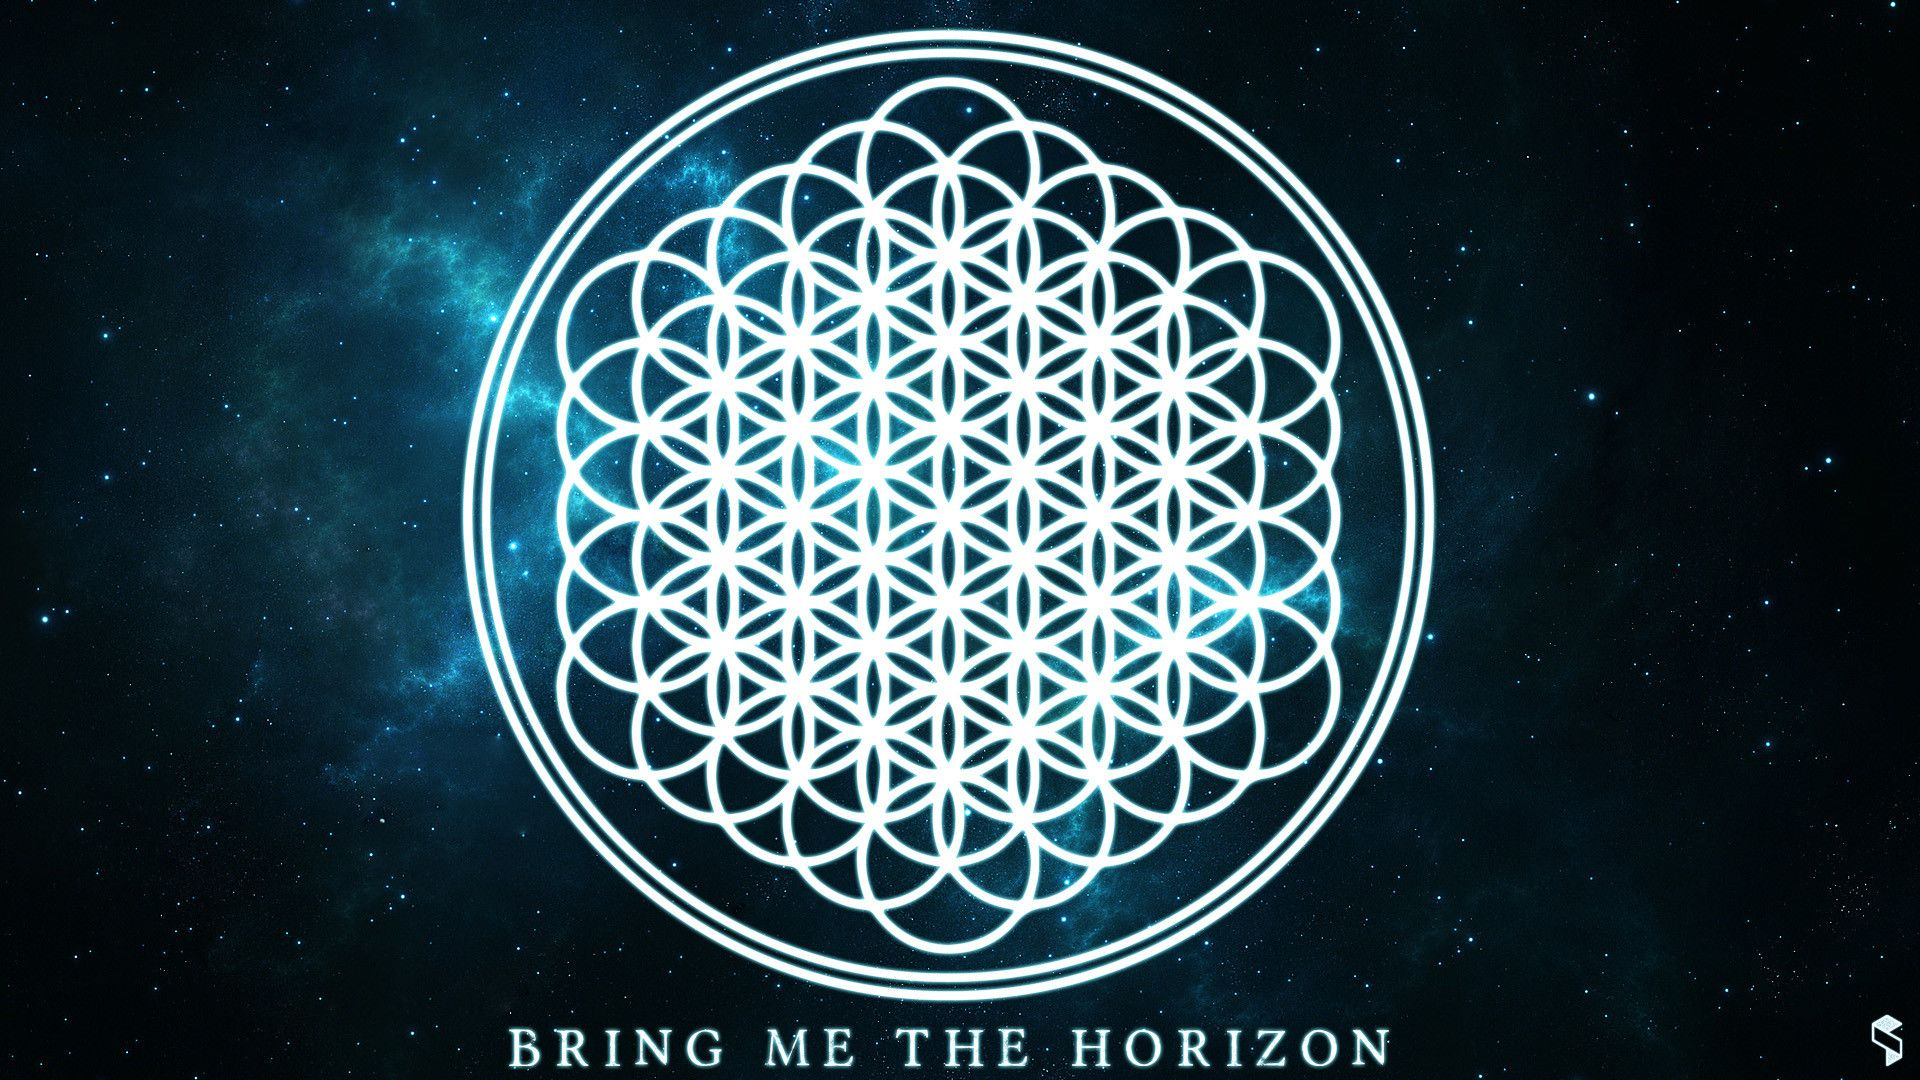 Bring Me The Horizon Wallpapers Top Free Bring Me The Horizon